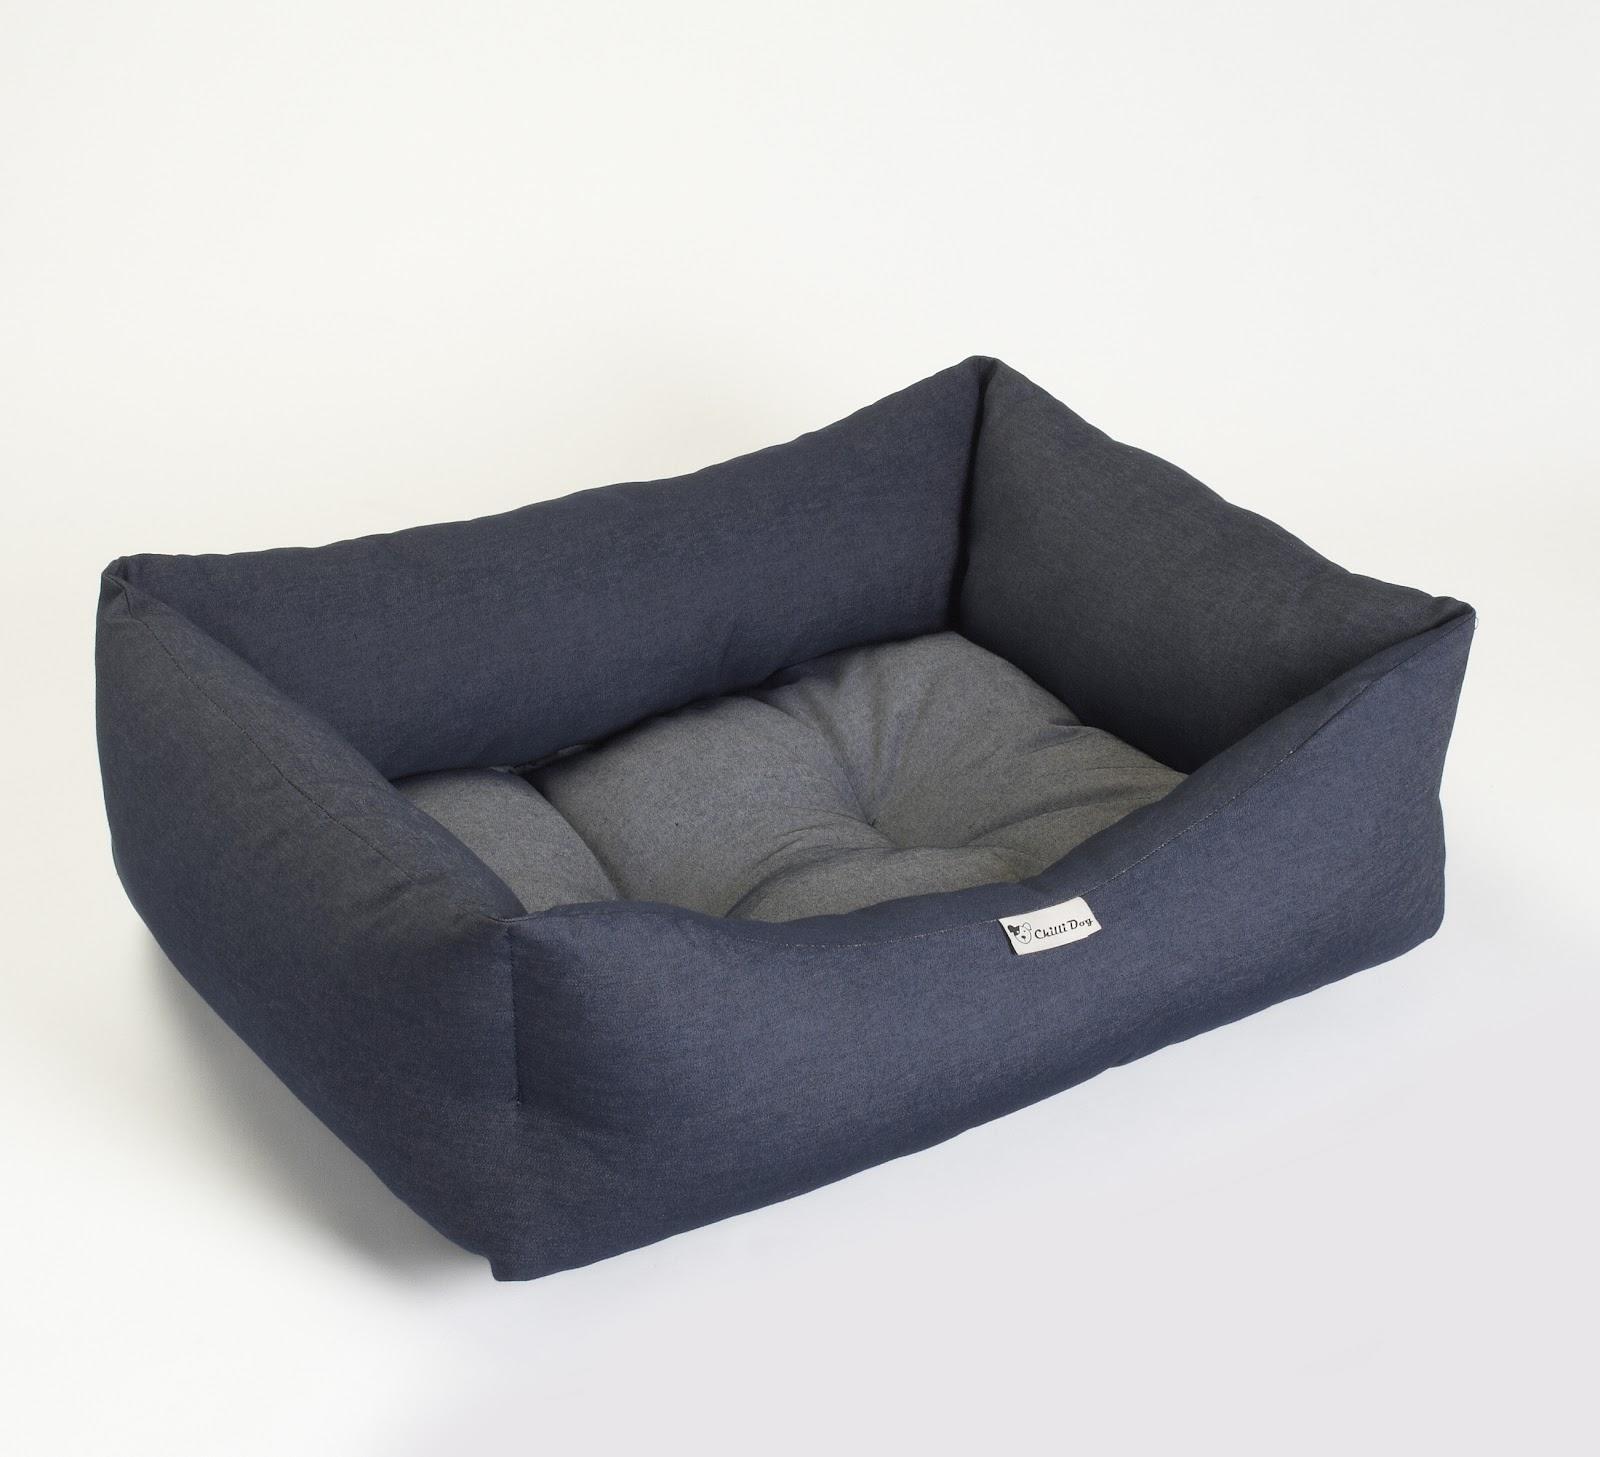 Chilli Dog Sofa Dog Beds Assorted